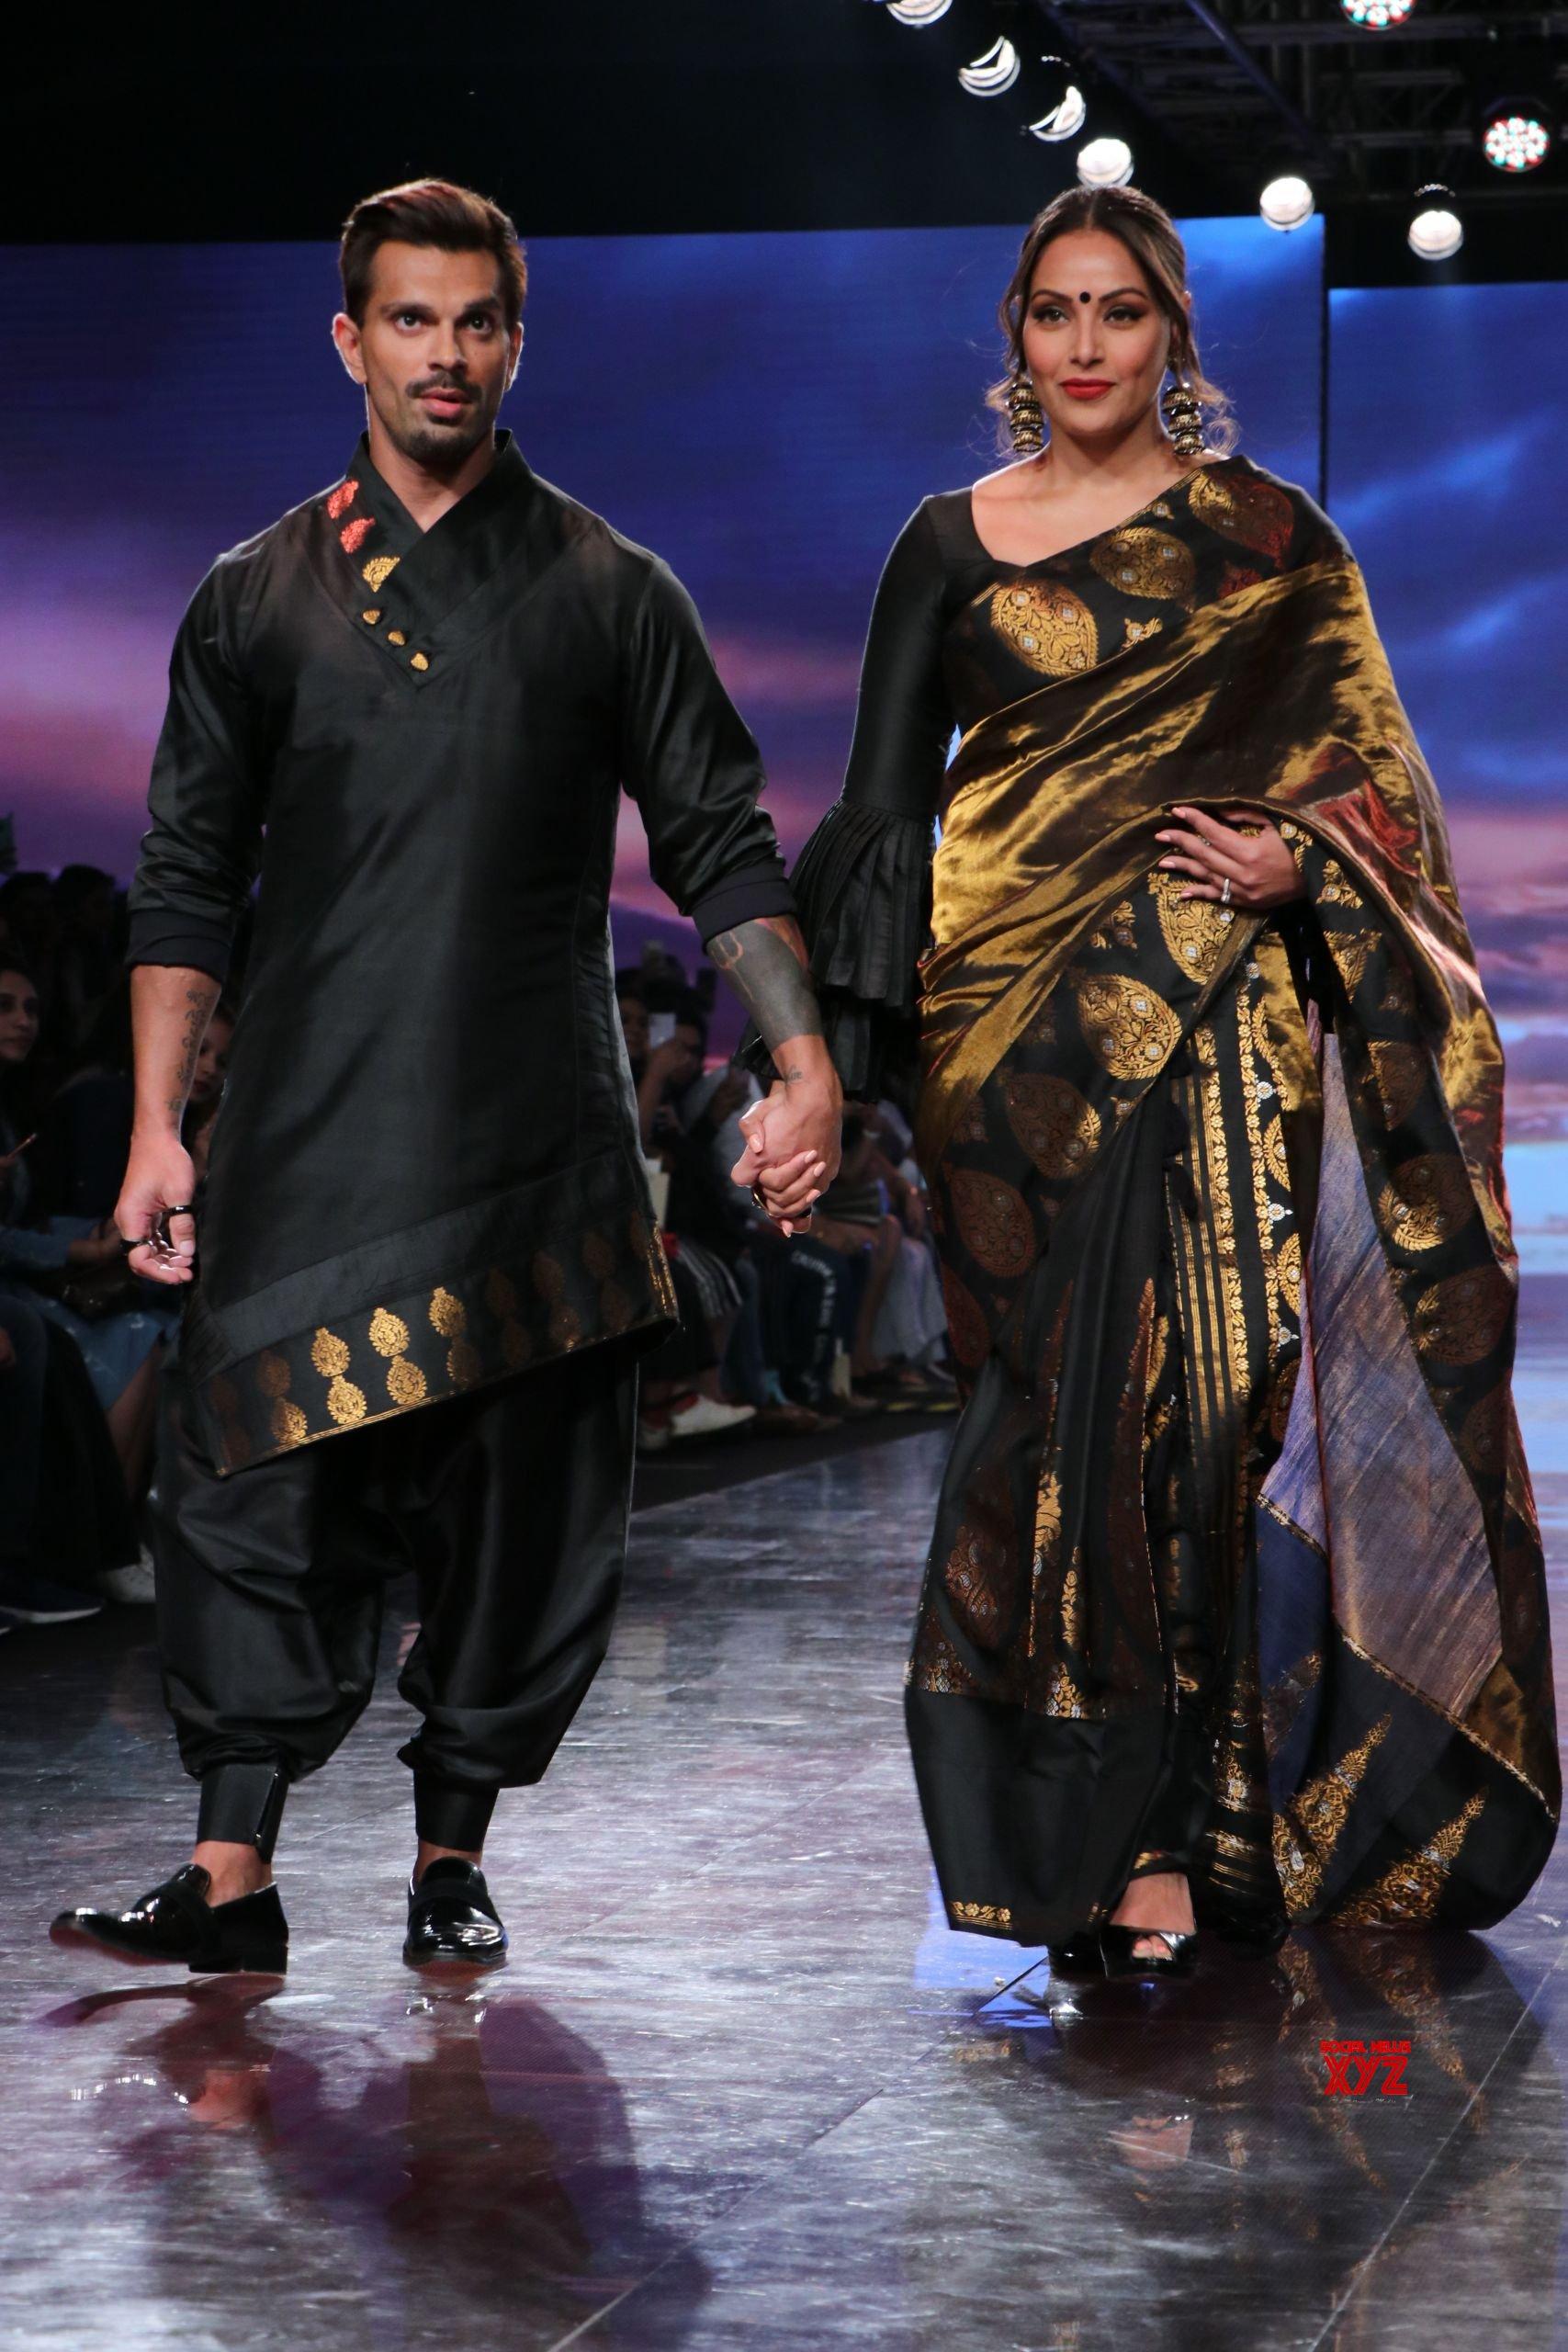 Bipasha Basu And Karan Singh Walked For Sanjukta At Lakme Fashion Week SR 2020 HD Gallery